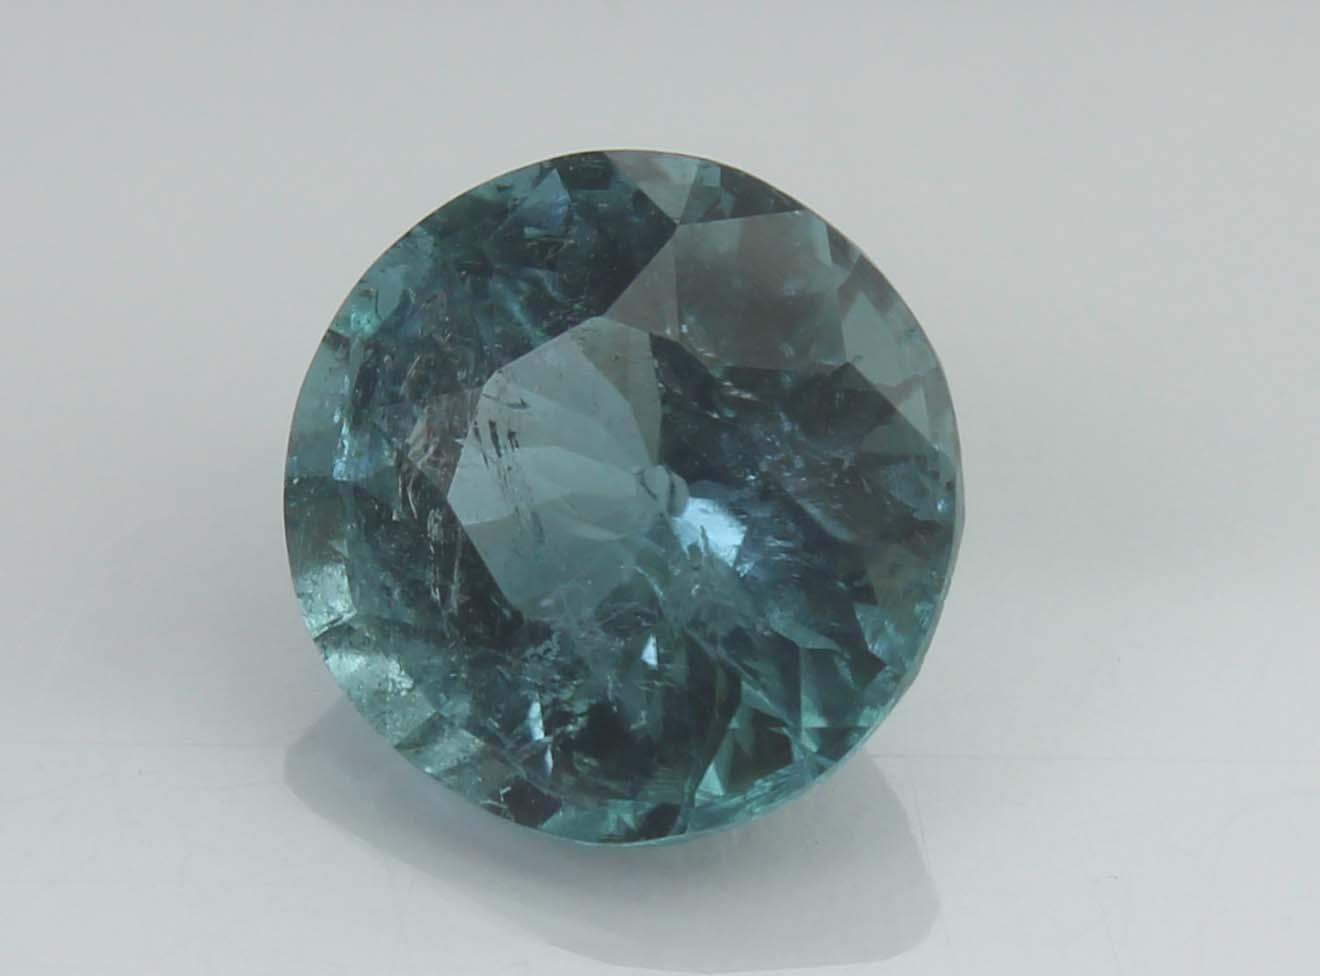 Blue Tourmaline, 2.37 Ct - Image 2 of 5